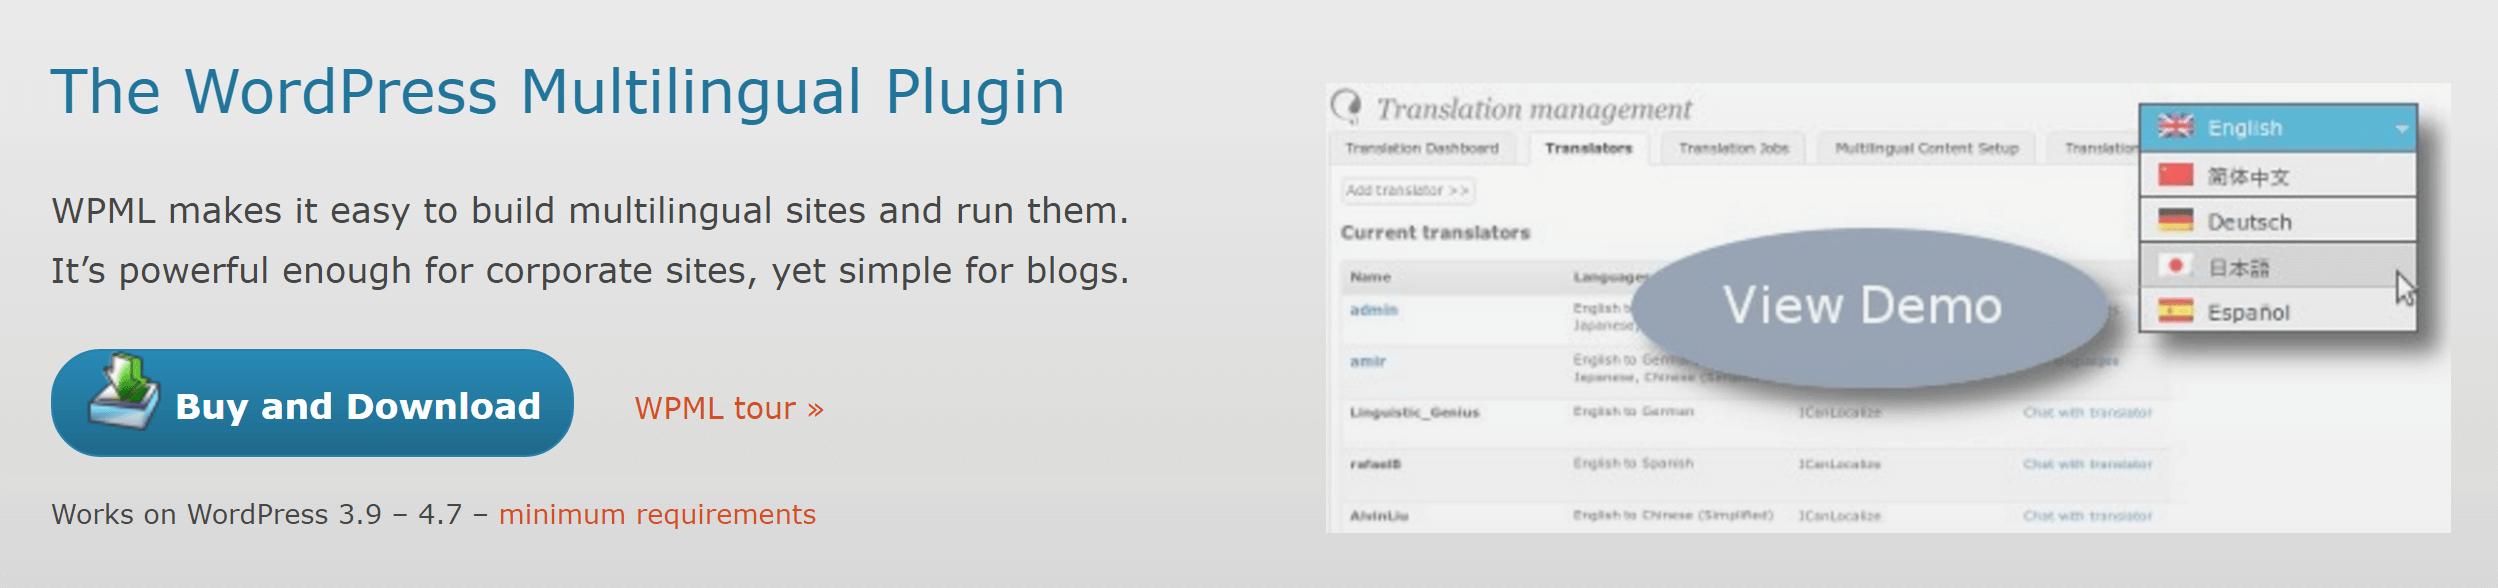 The WPML plugin - your way to create a multilingual WordPress website.